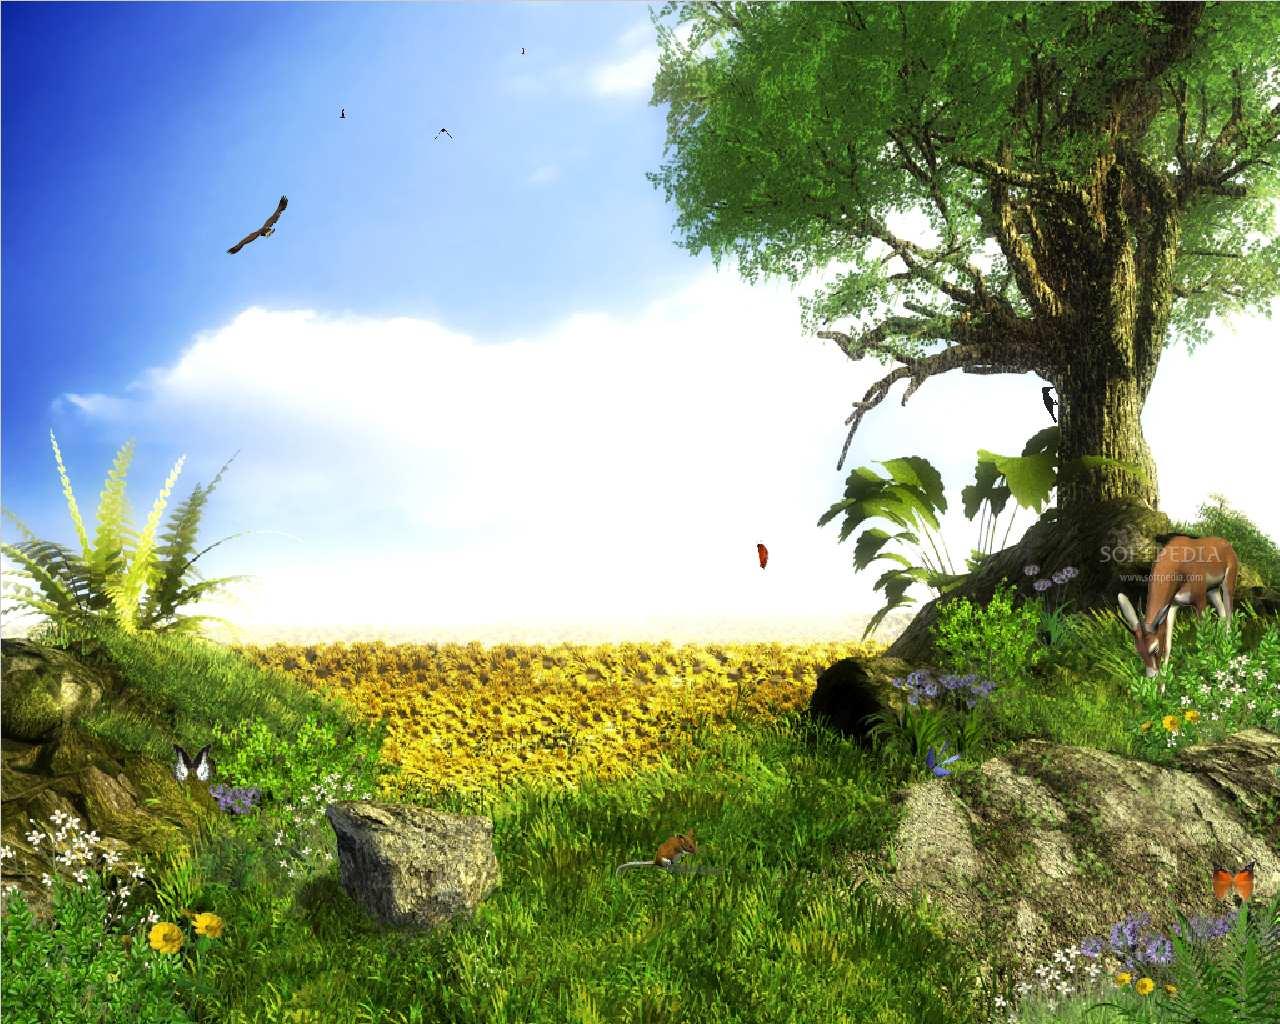 landscape computer image